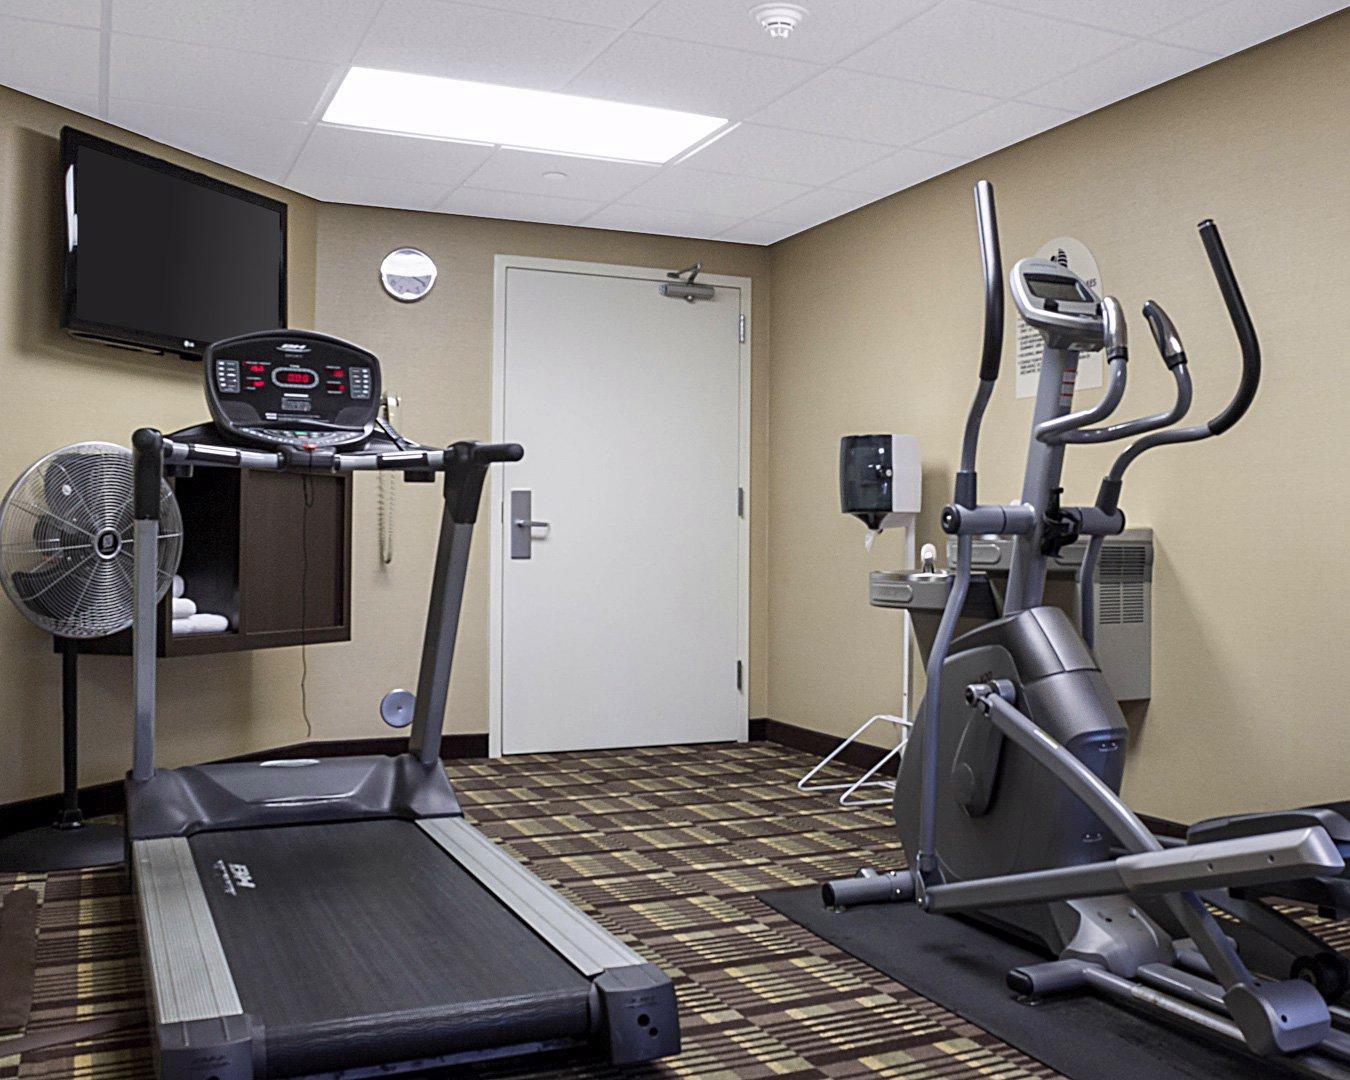 Denver Mattress Bismarck Mainstay Suites in Bismarck, ND | Whitepages